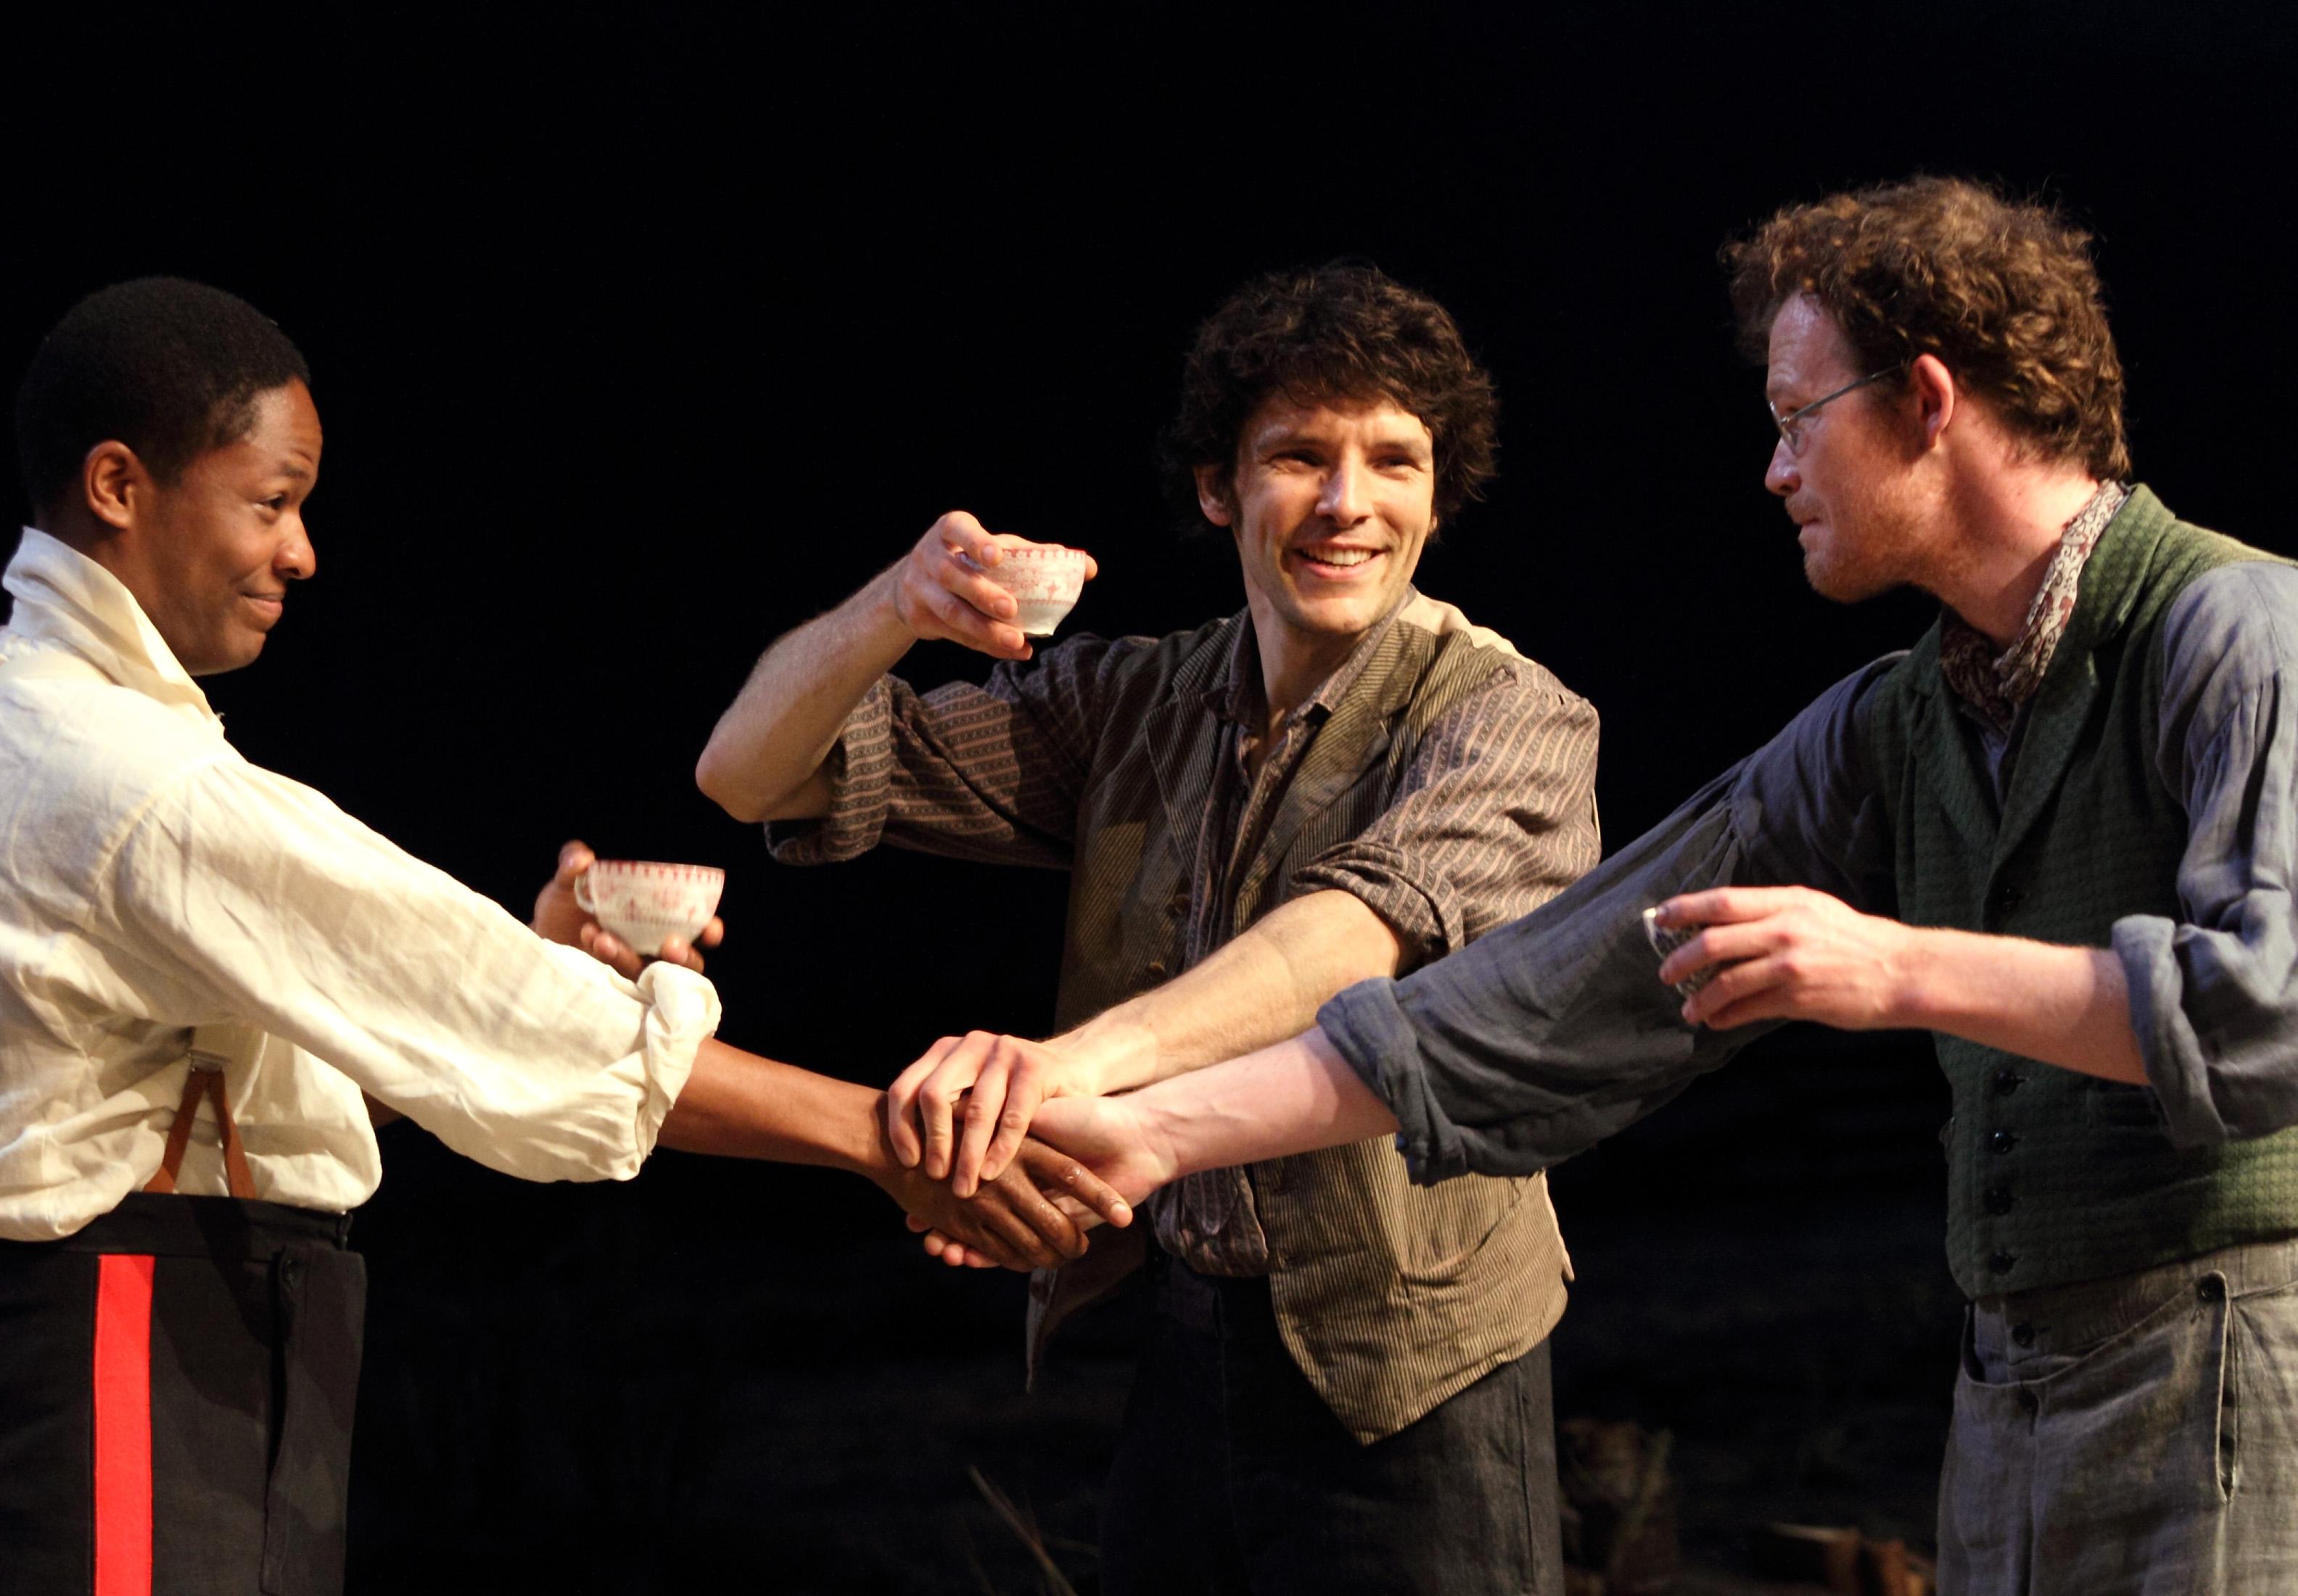 Adetomiwa Edun (Lieutenant Yolland), Colin Morgan (Owen), Seamus O'Hara (Manus). Image by Catherine Ashmore